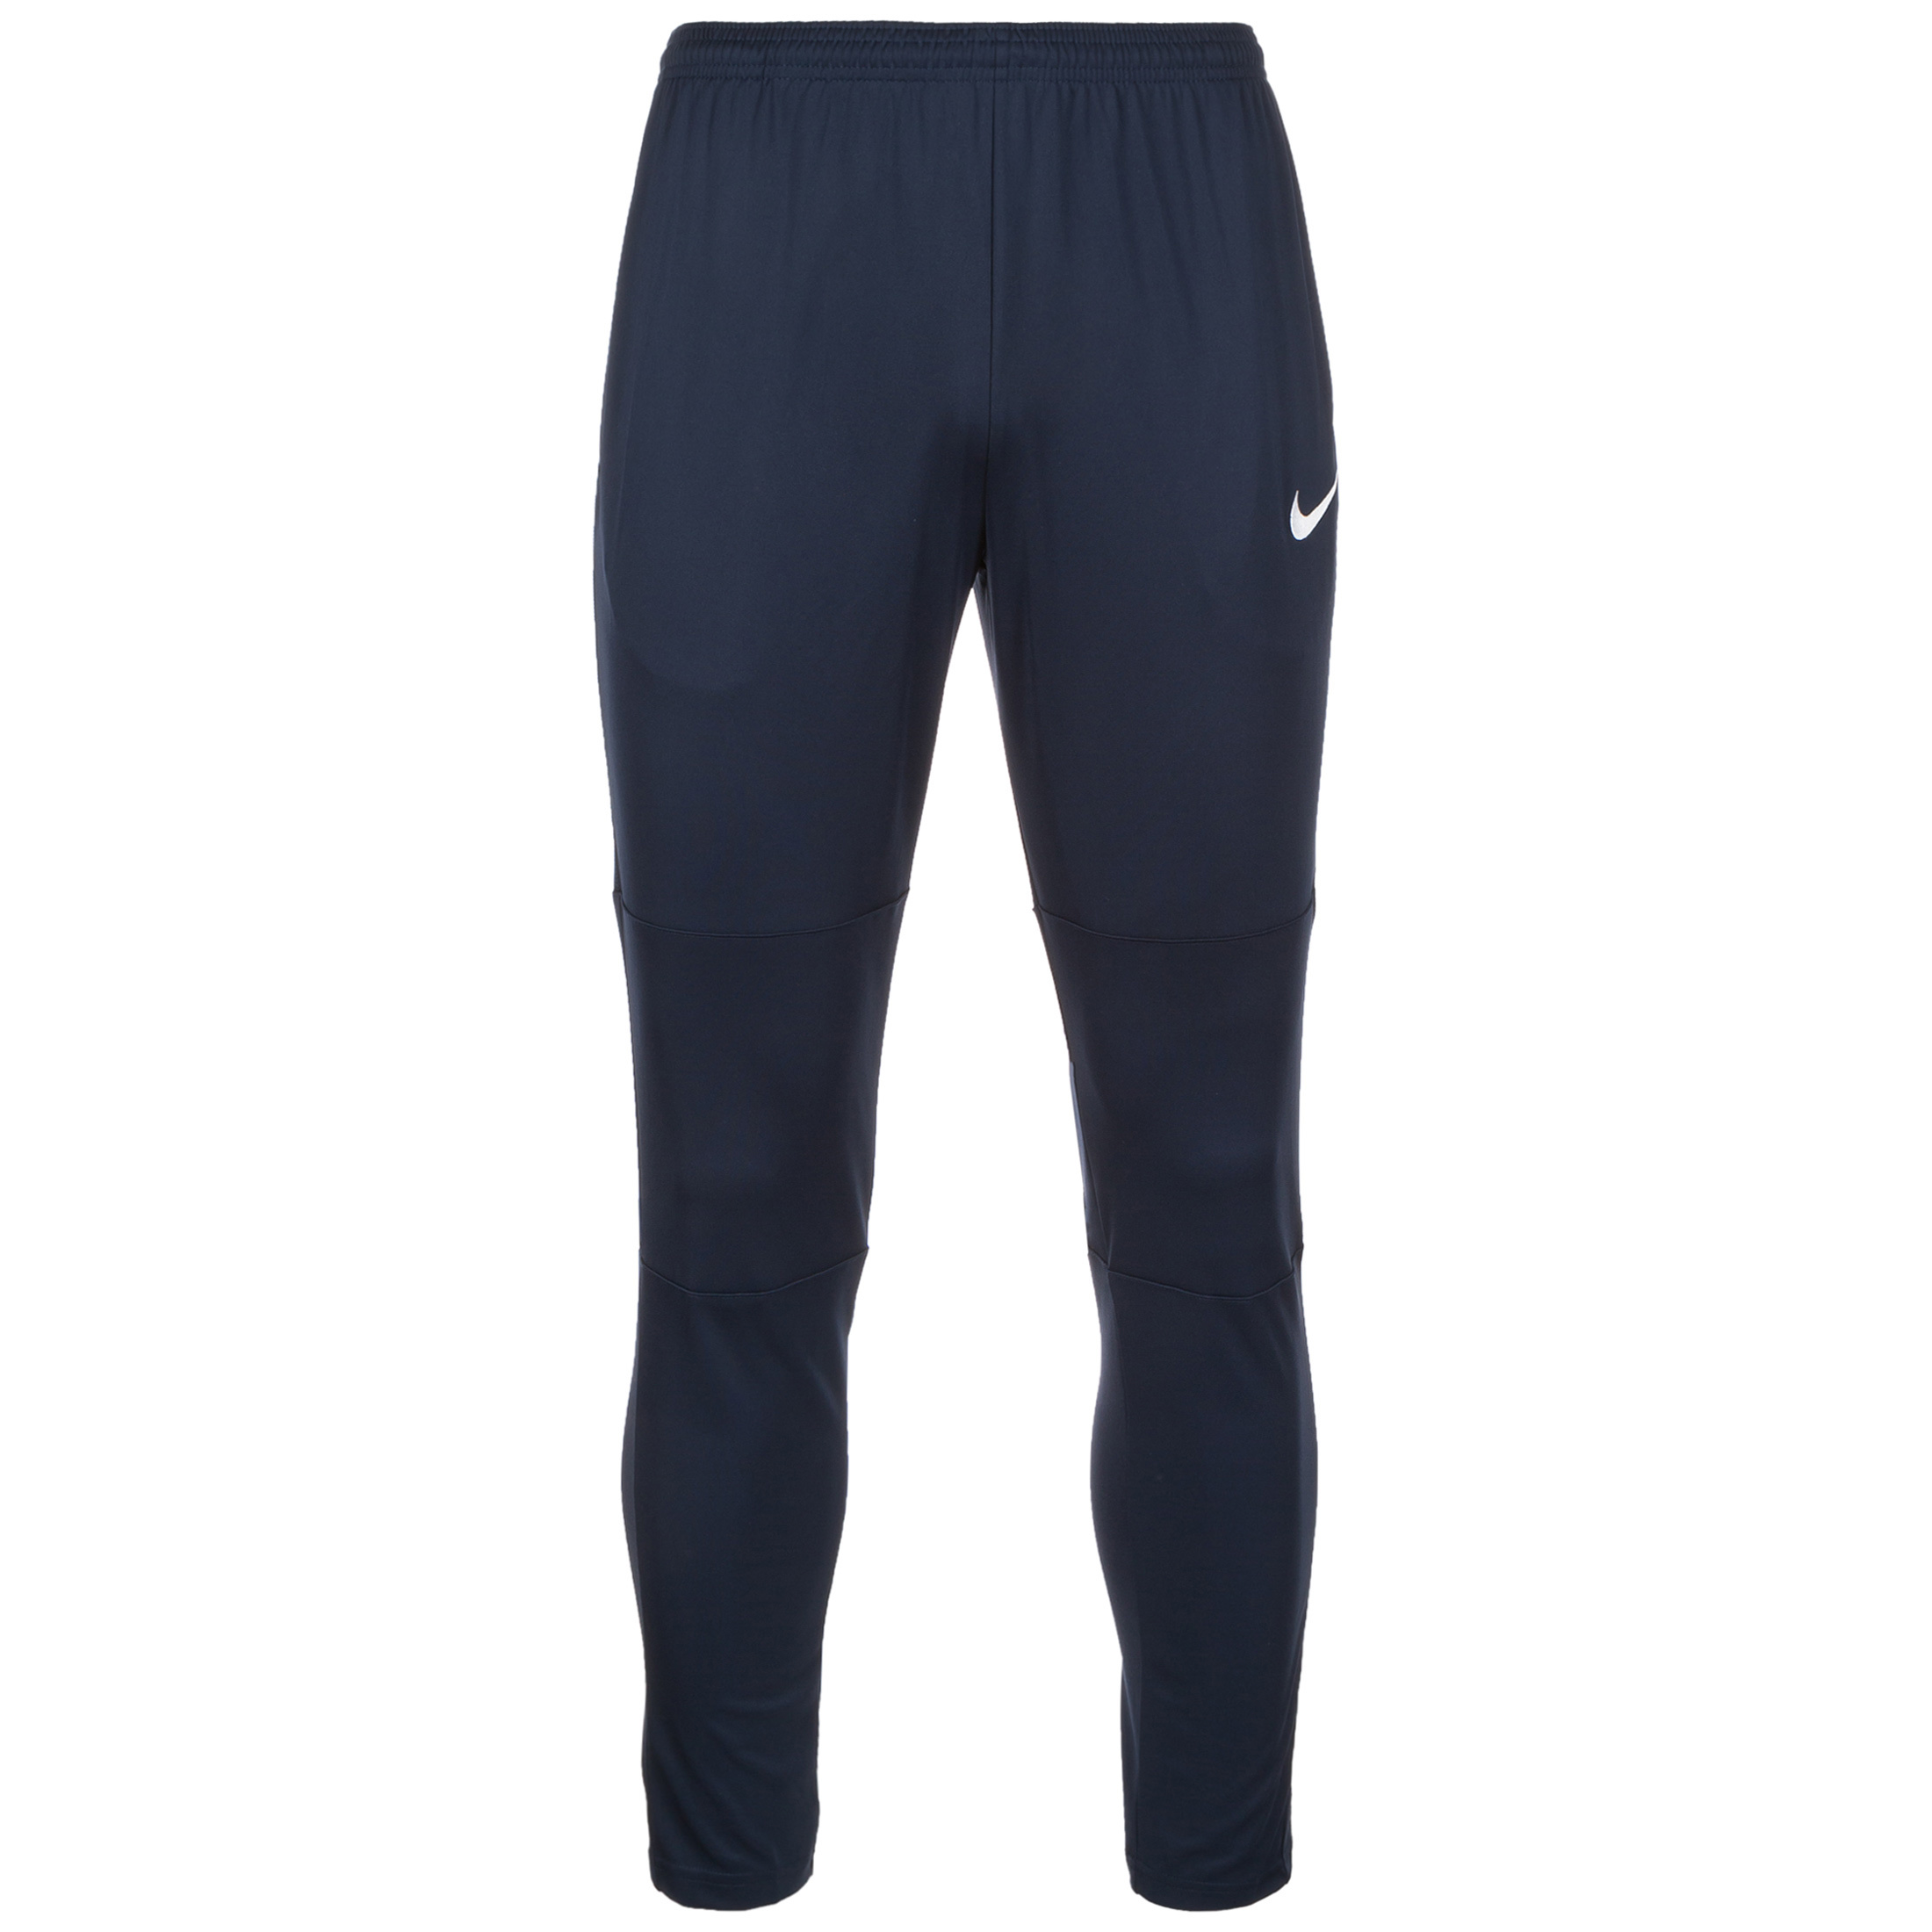 7afdbaa034b88 Nike Training Trousers Dry Park 18 - Obsidian/White | AA2086-451 | FOOTY.COM